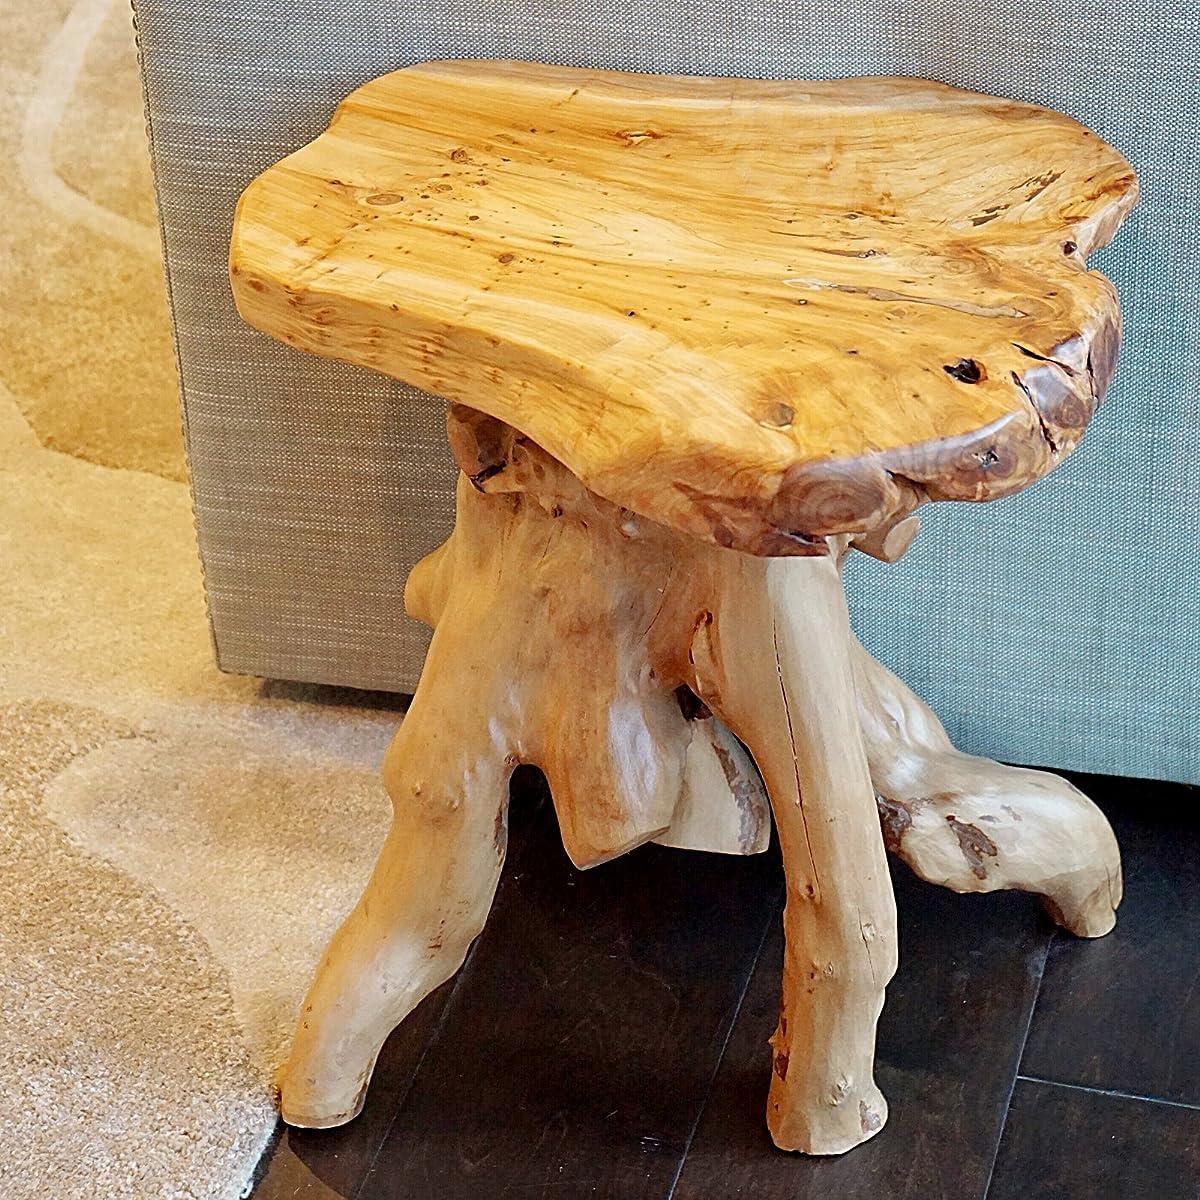 WELLAND Cedar Root Wood Log Side Table, End Table, Rustic Primitive Natural Live Edge